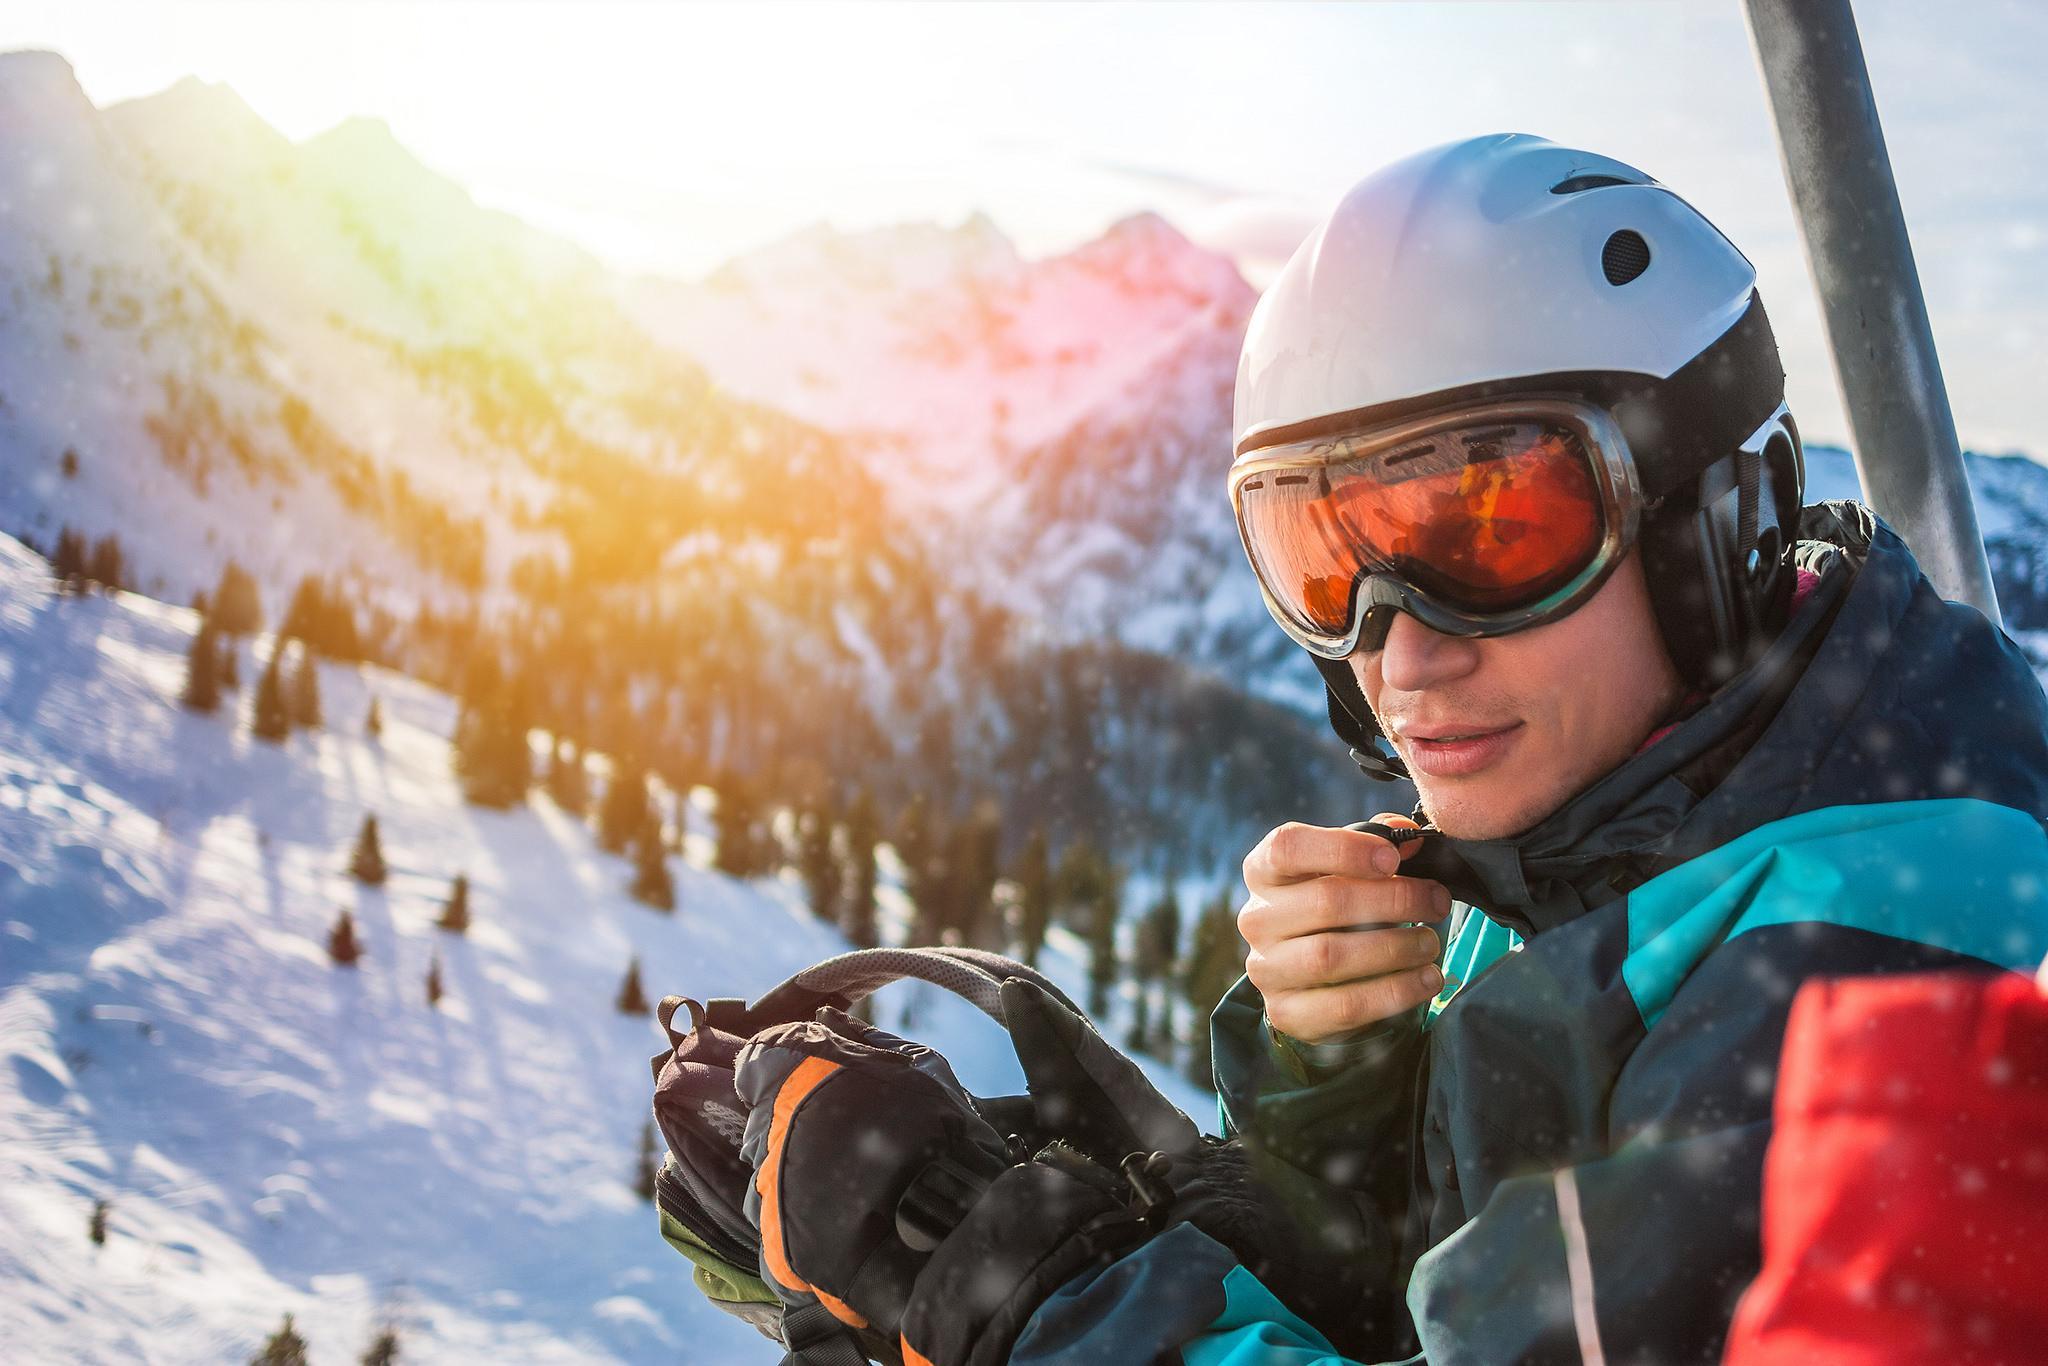 Heliski for Advanced Skiers